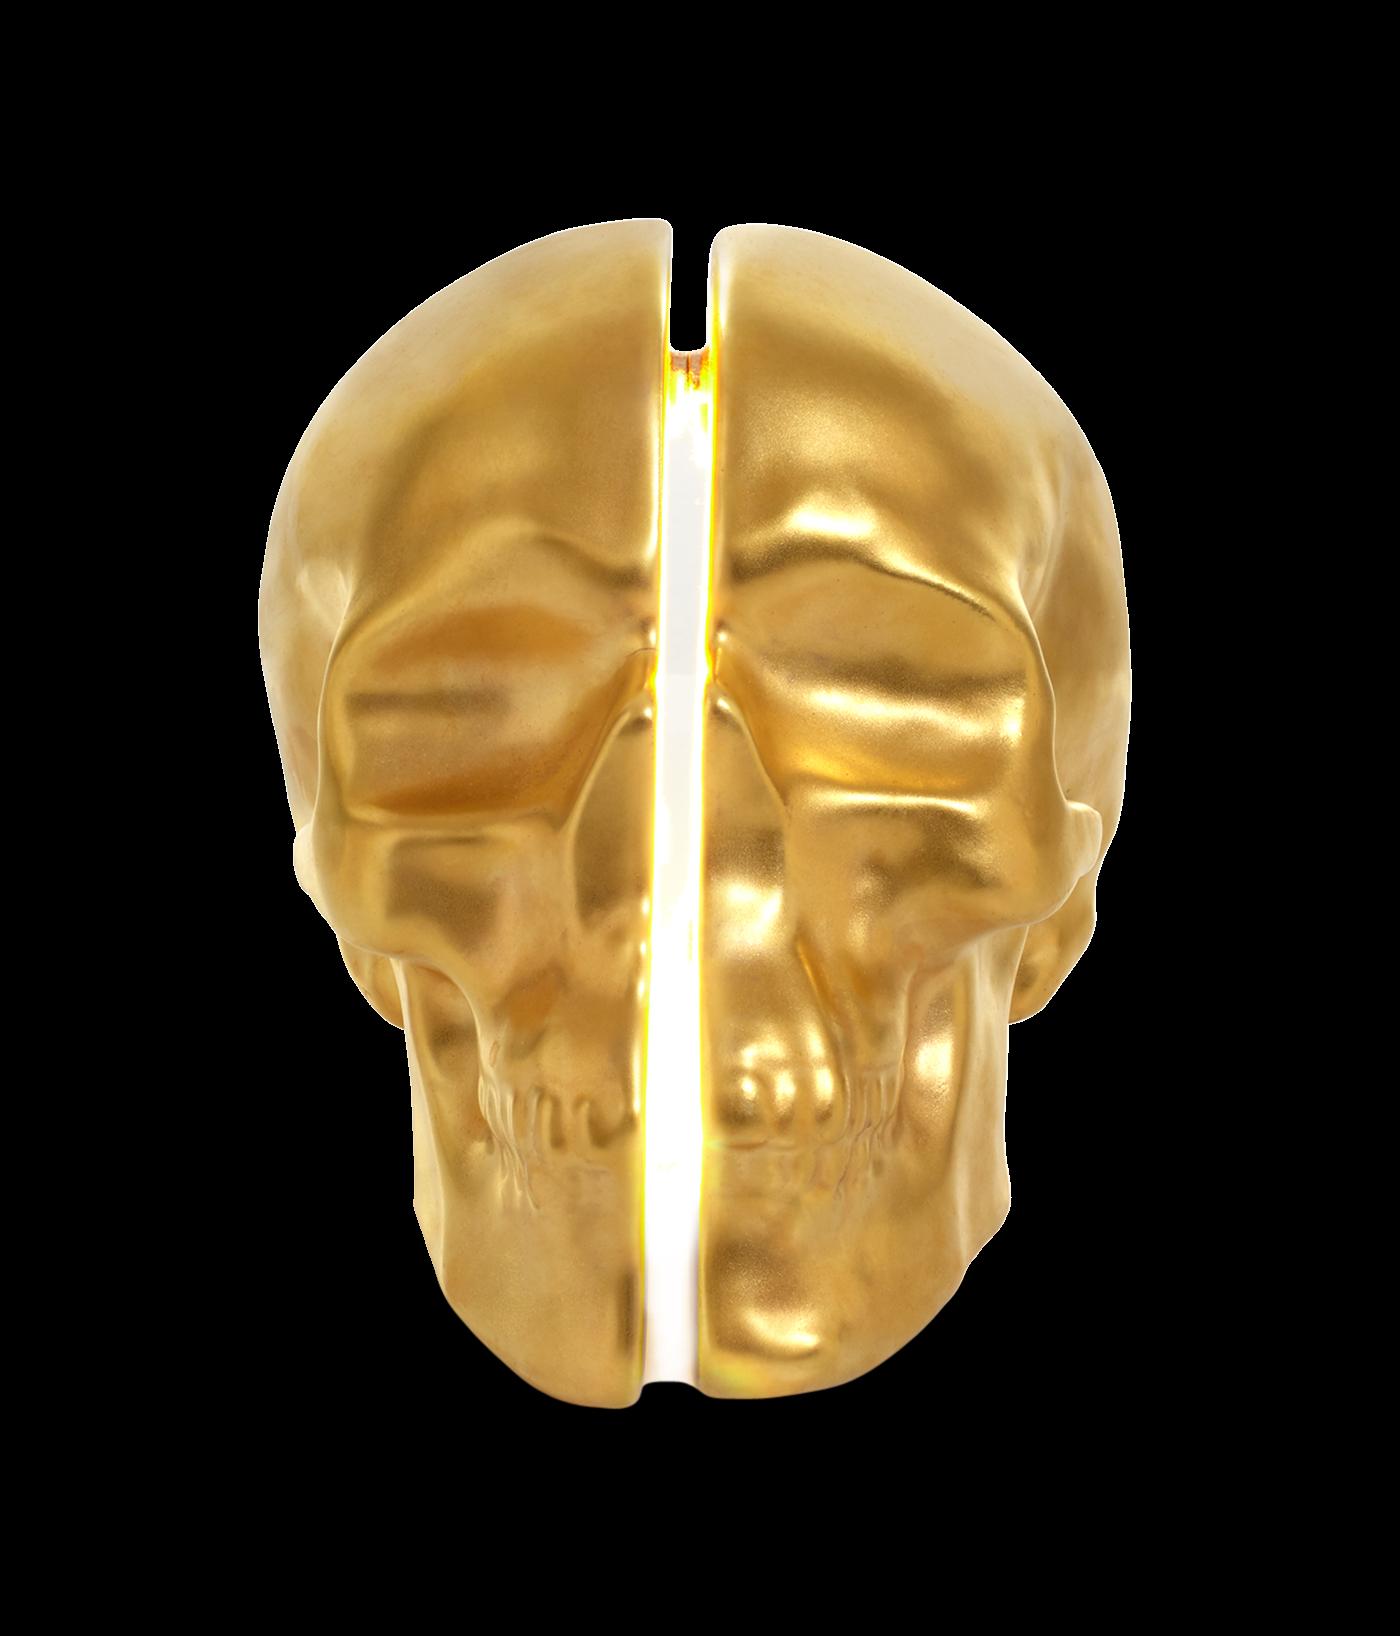 Yorick Skull Lamp 24kt Gold Hand Painted 0